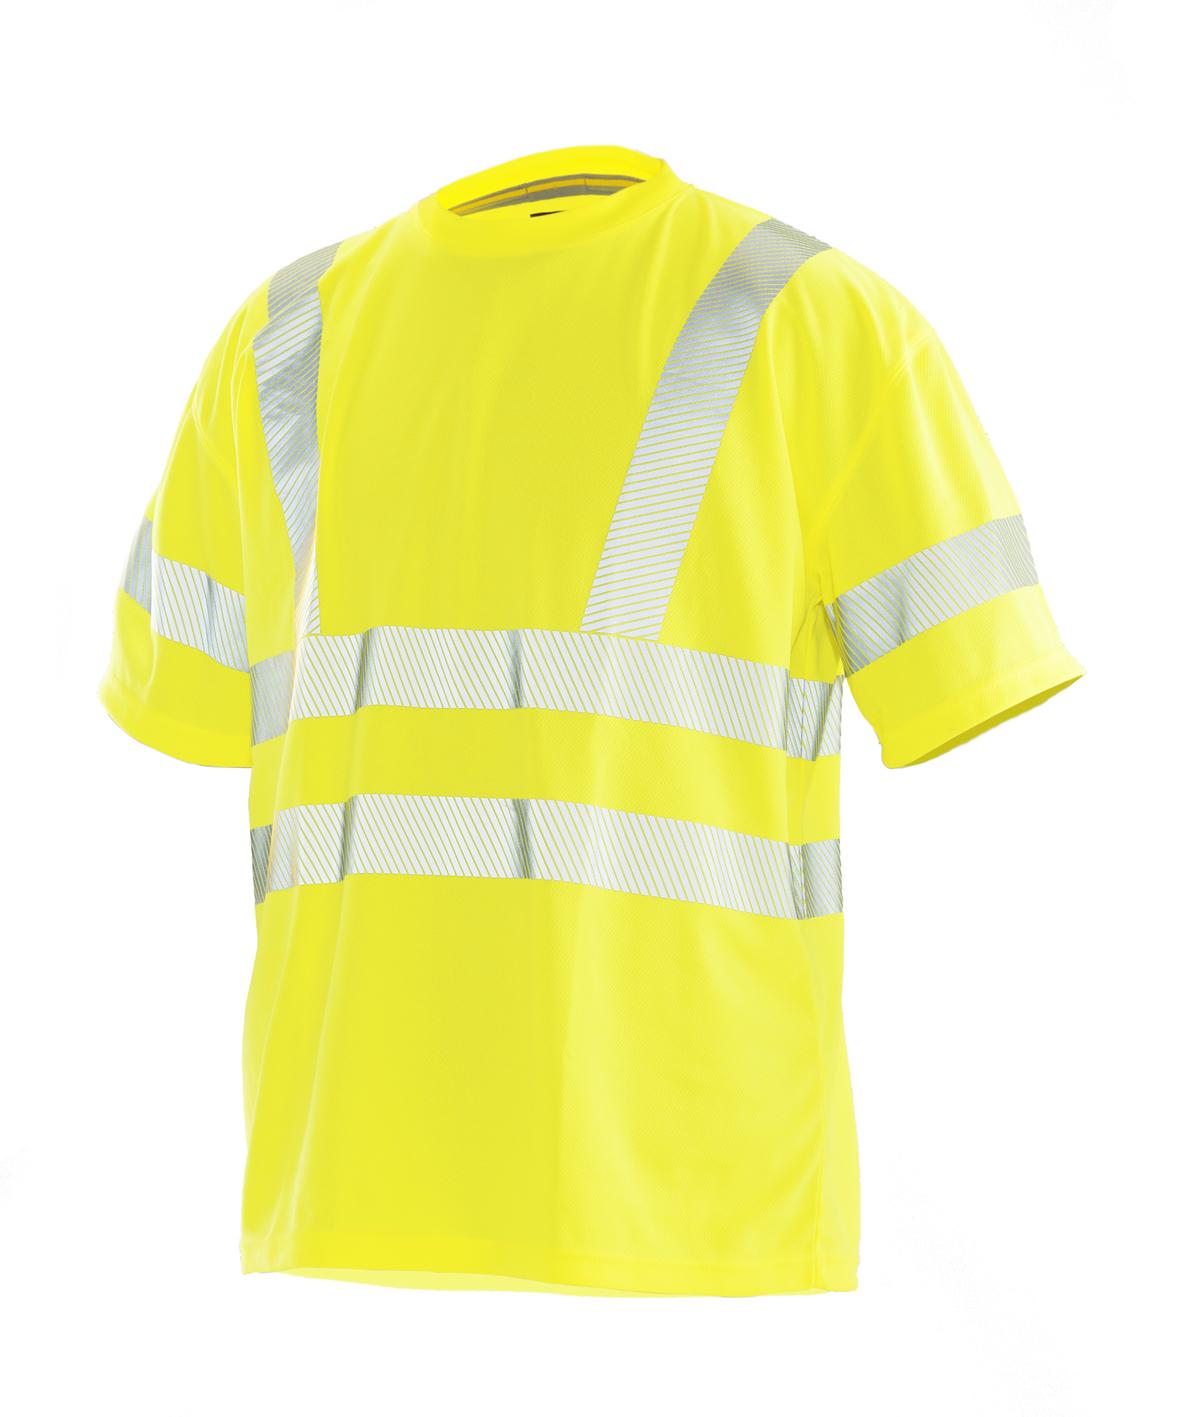 5584 T-shirt Hi-Vis 3XL jaune